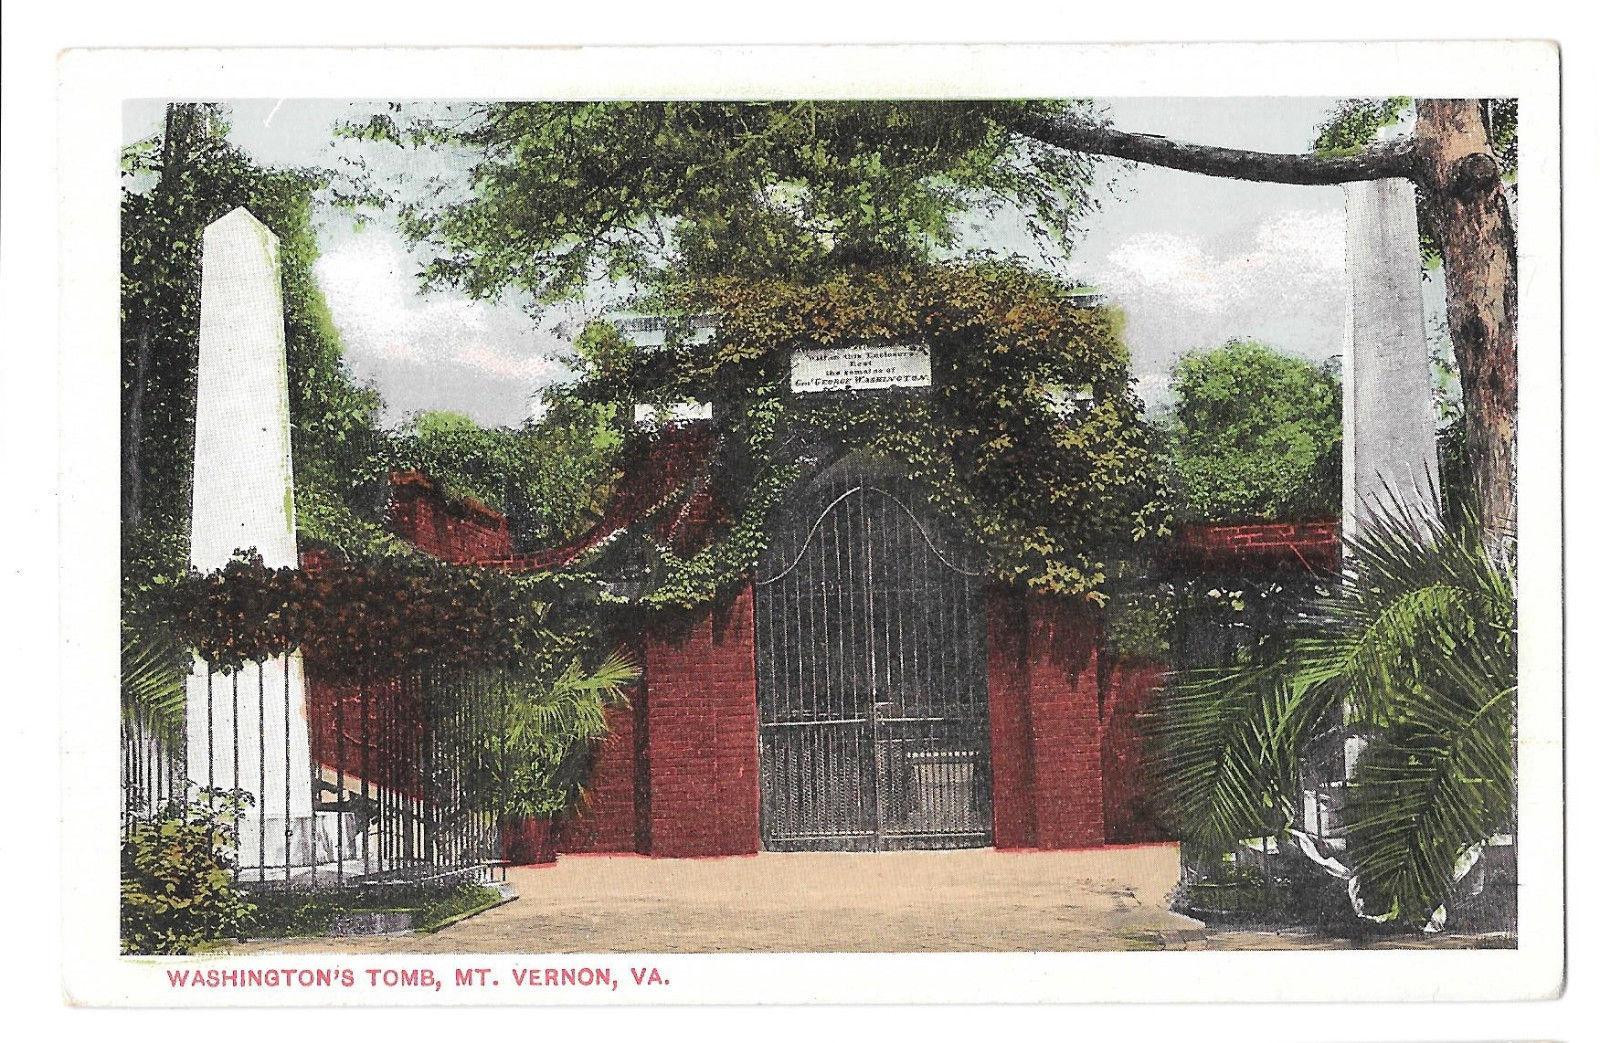 VA Mt Vernon Washingtons Tomb Vtg B S Reynolds White Border Postcard Virginia